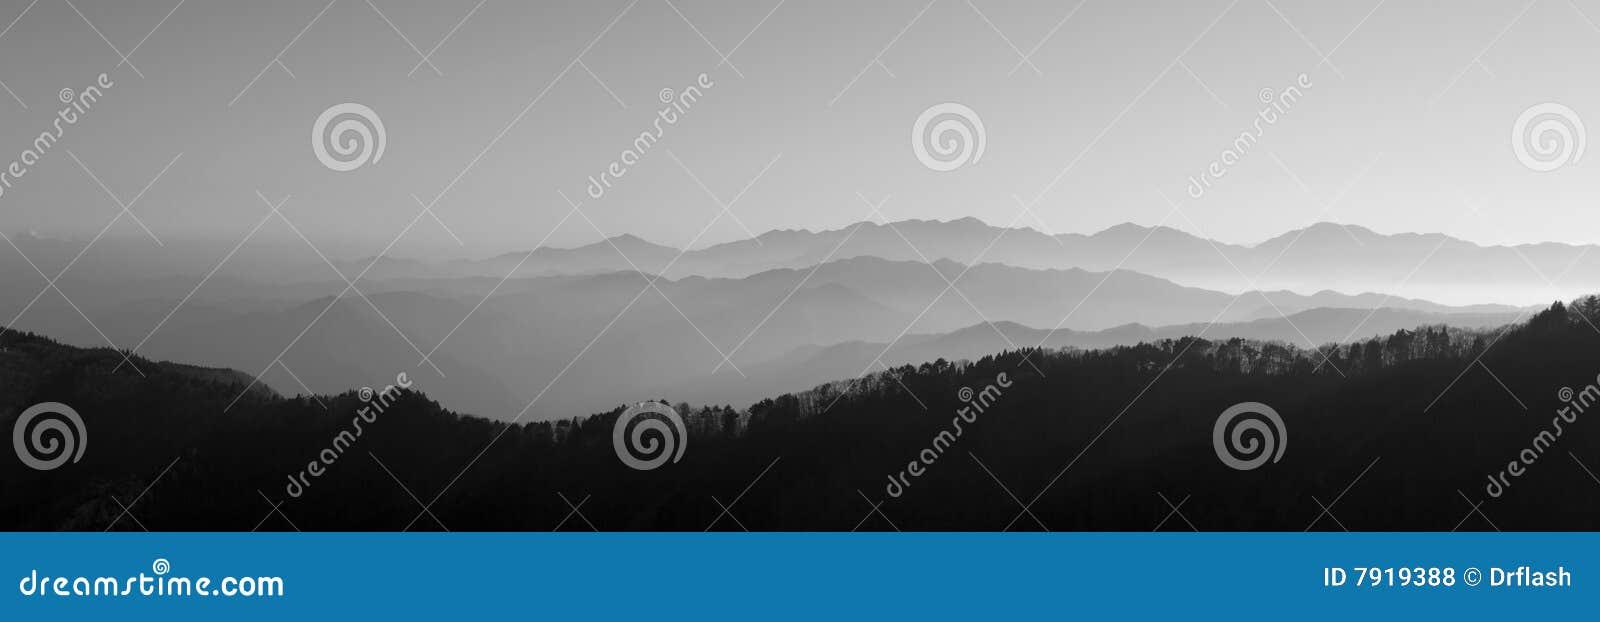 Asian gifts mountain view